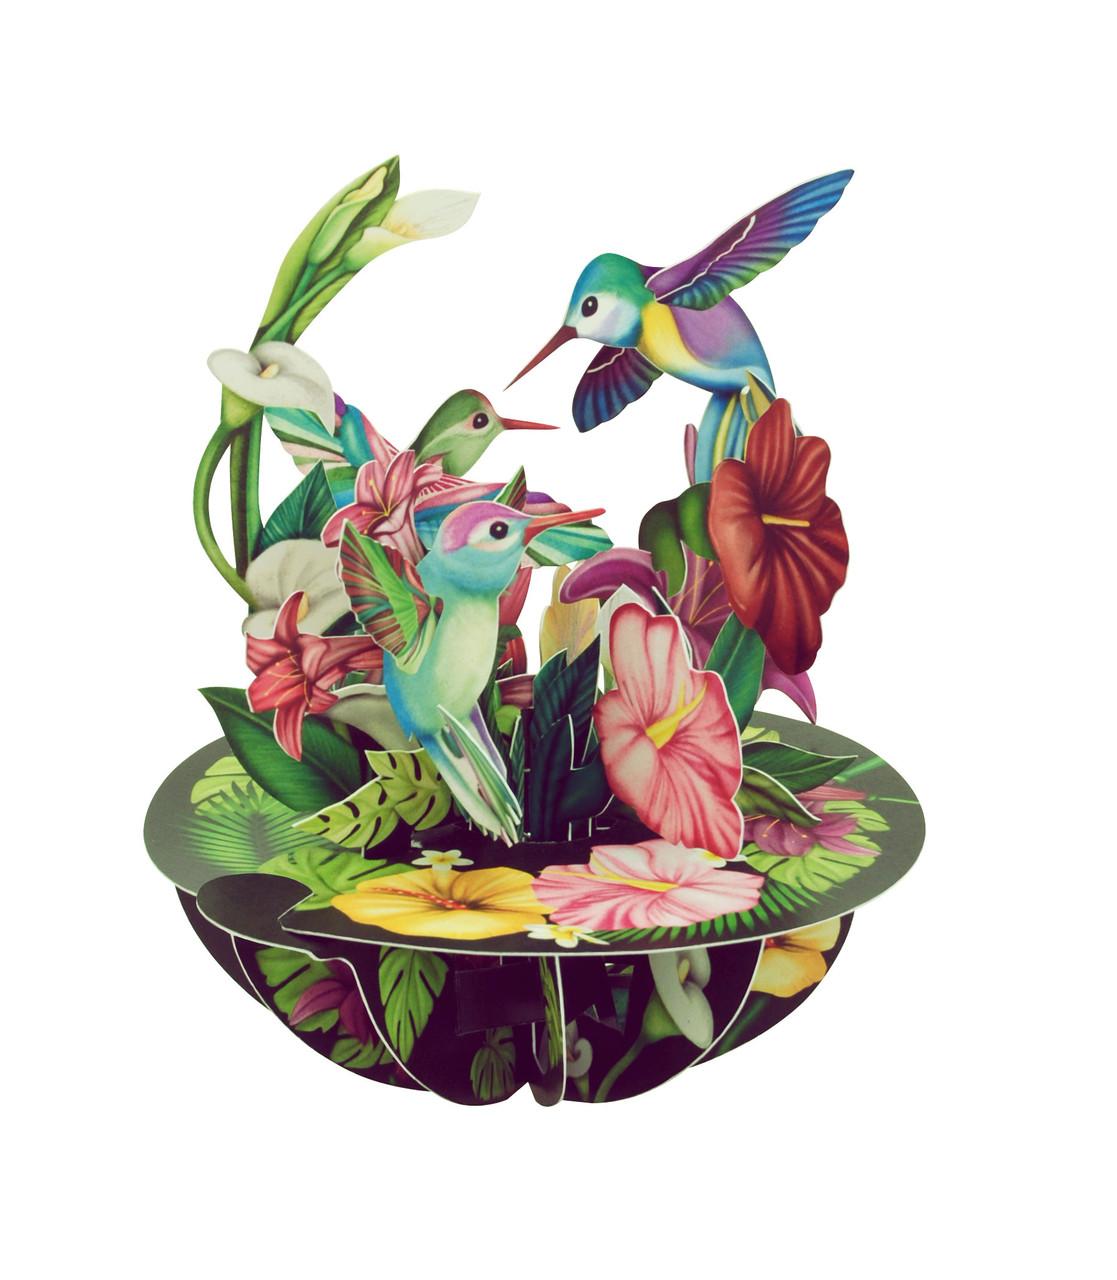 Hummingbirds Santoro Popnrock 3D Greeting Card